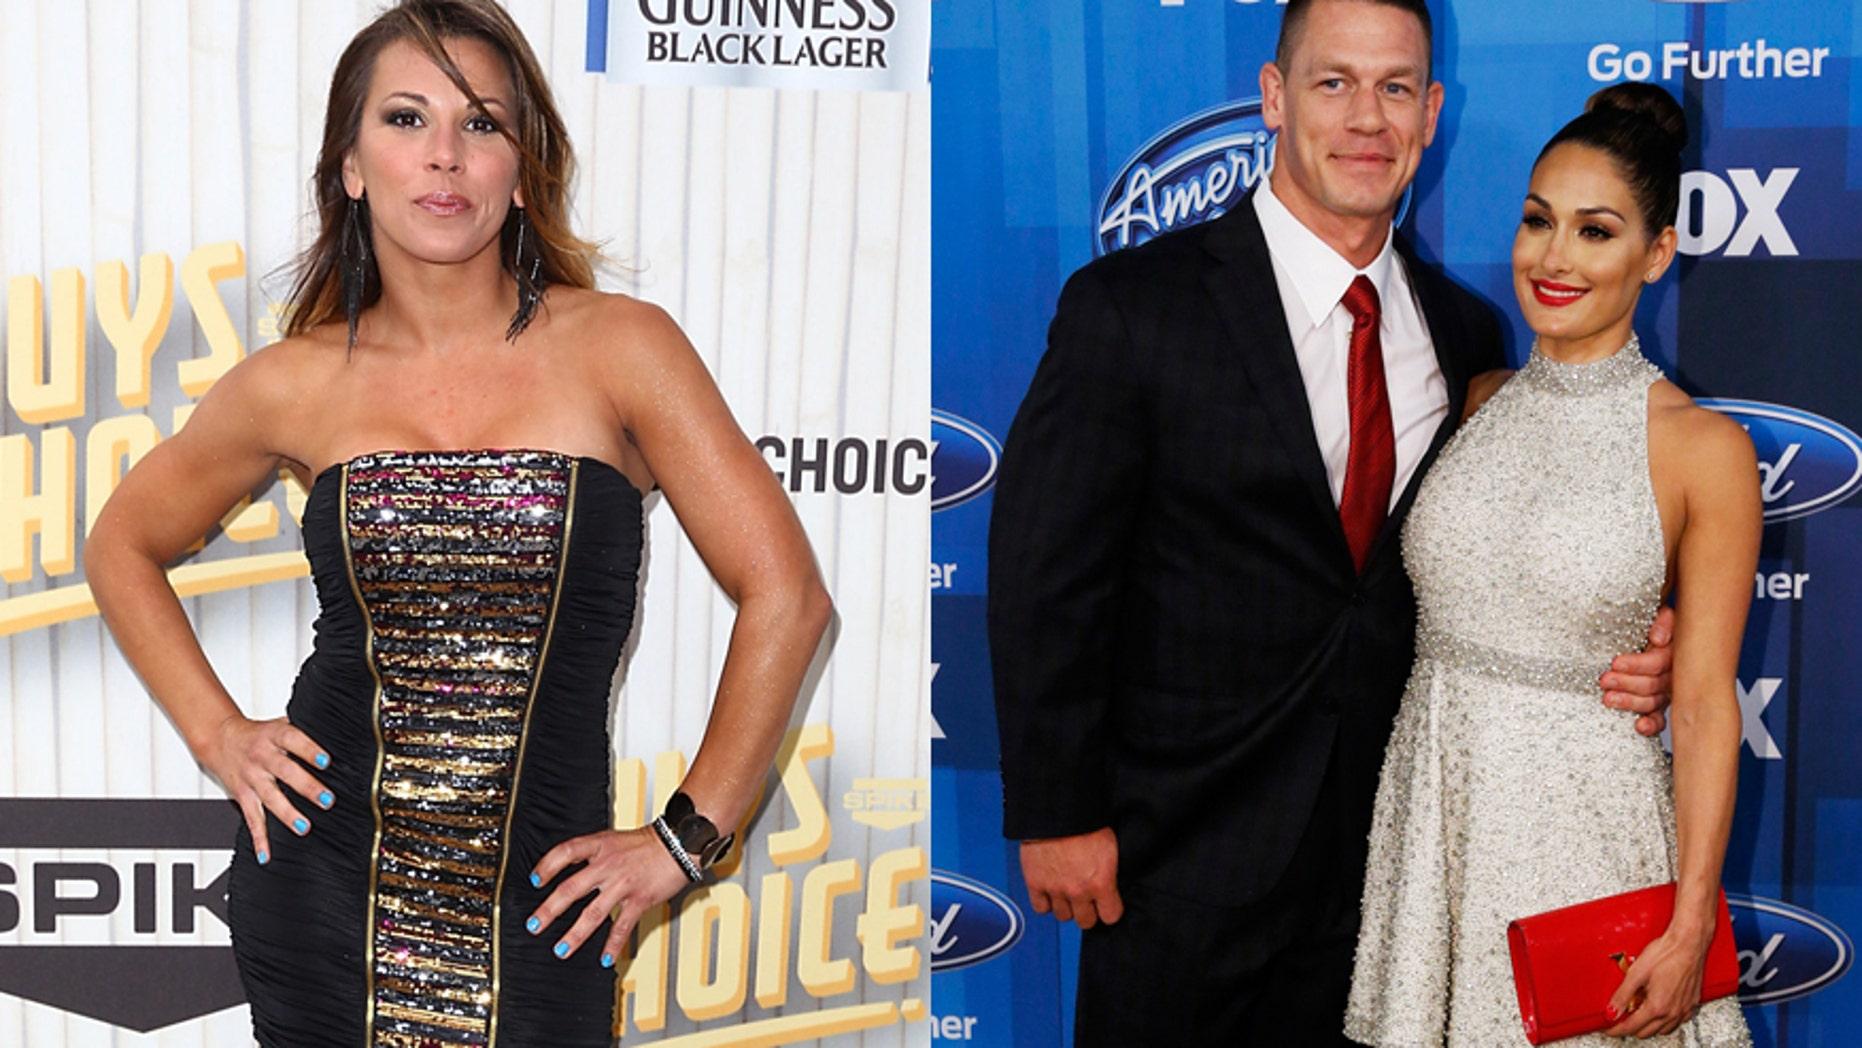 Mickie James (left) and John Cena with girlfriend Nikki Bella.